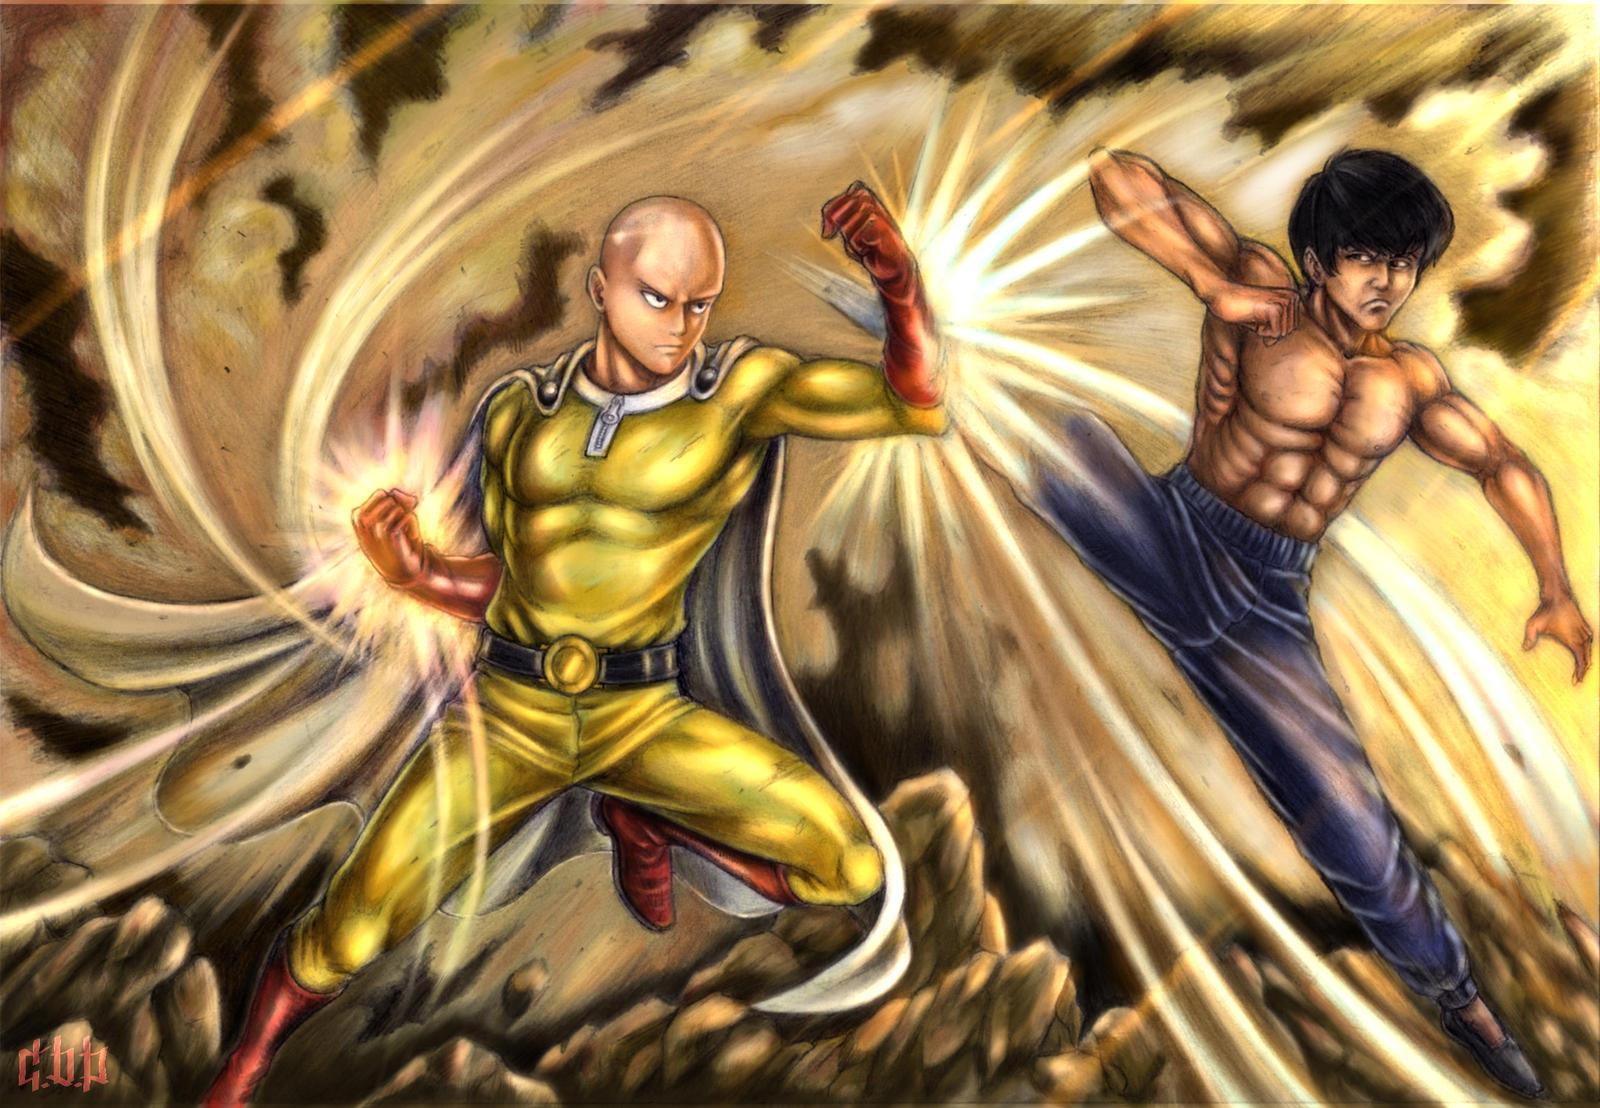 Saitama Vs. Bruce Lee by kchan05 on DeviantArt